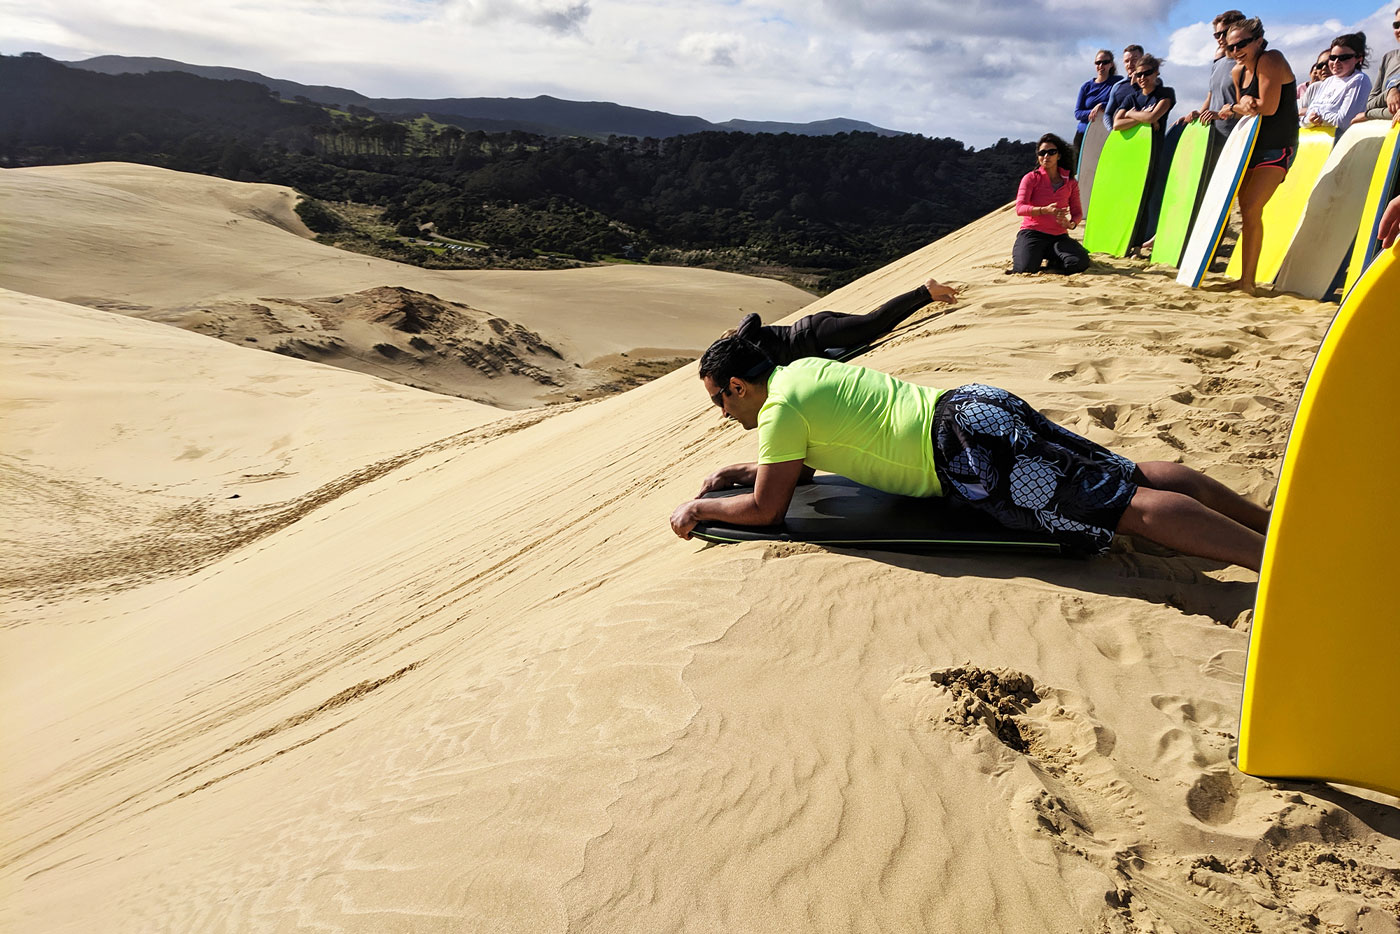 New-Zealand-Gap-Year-Tours-Te-Paki-Sandboarding-Slides-Adventure-Tour-New-Zeland-Adventure-Tours-NZ-Tours-&-Travel-Kiwi-Small-Group-Tours-Gap-Year-Tour-in-New-Zeland-Grabatour-Travel